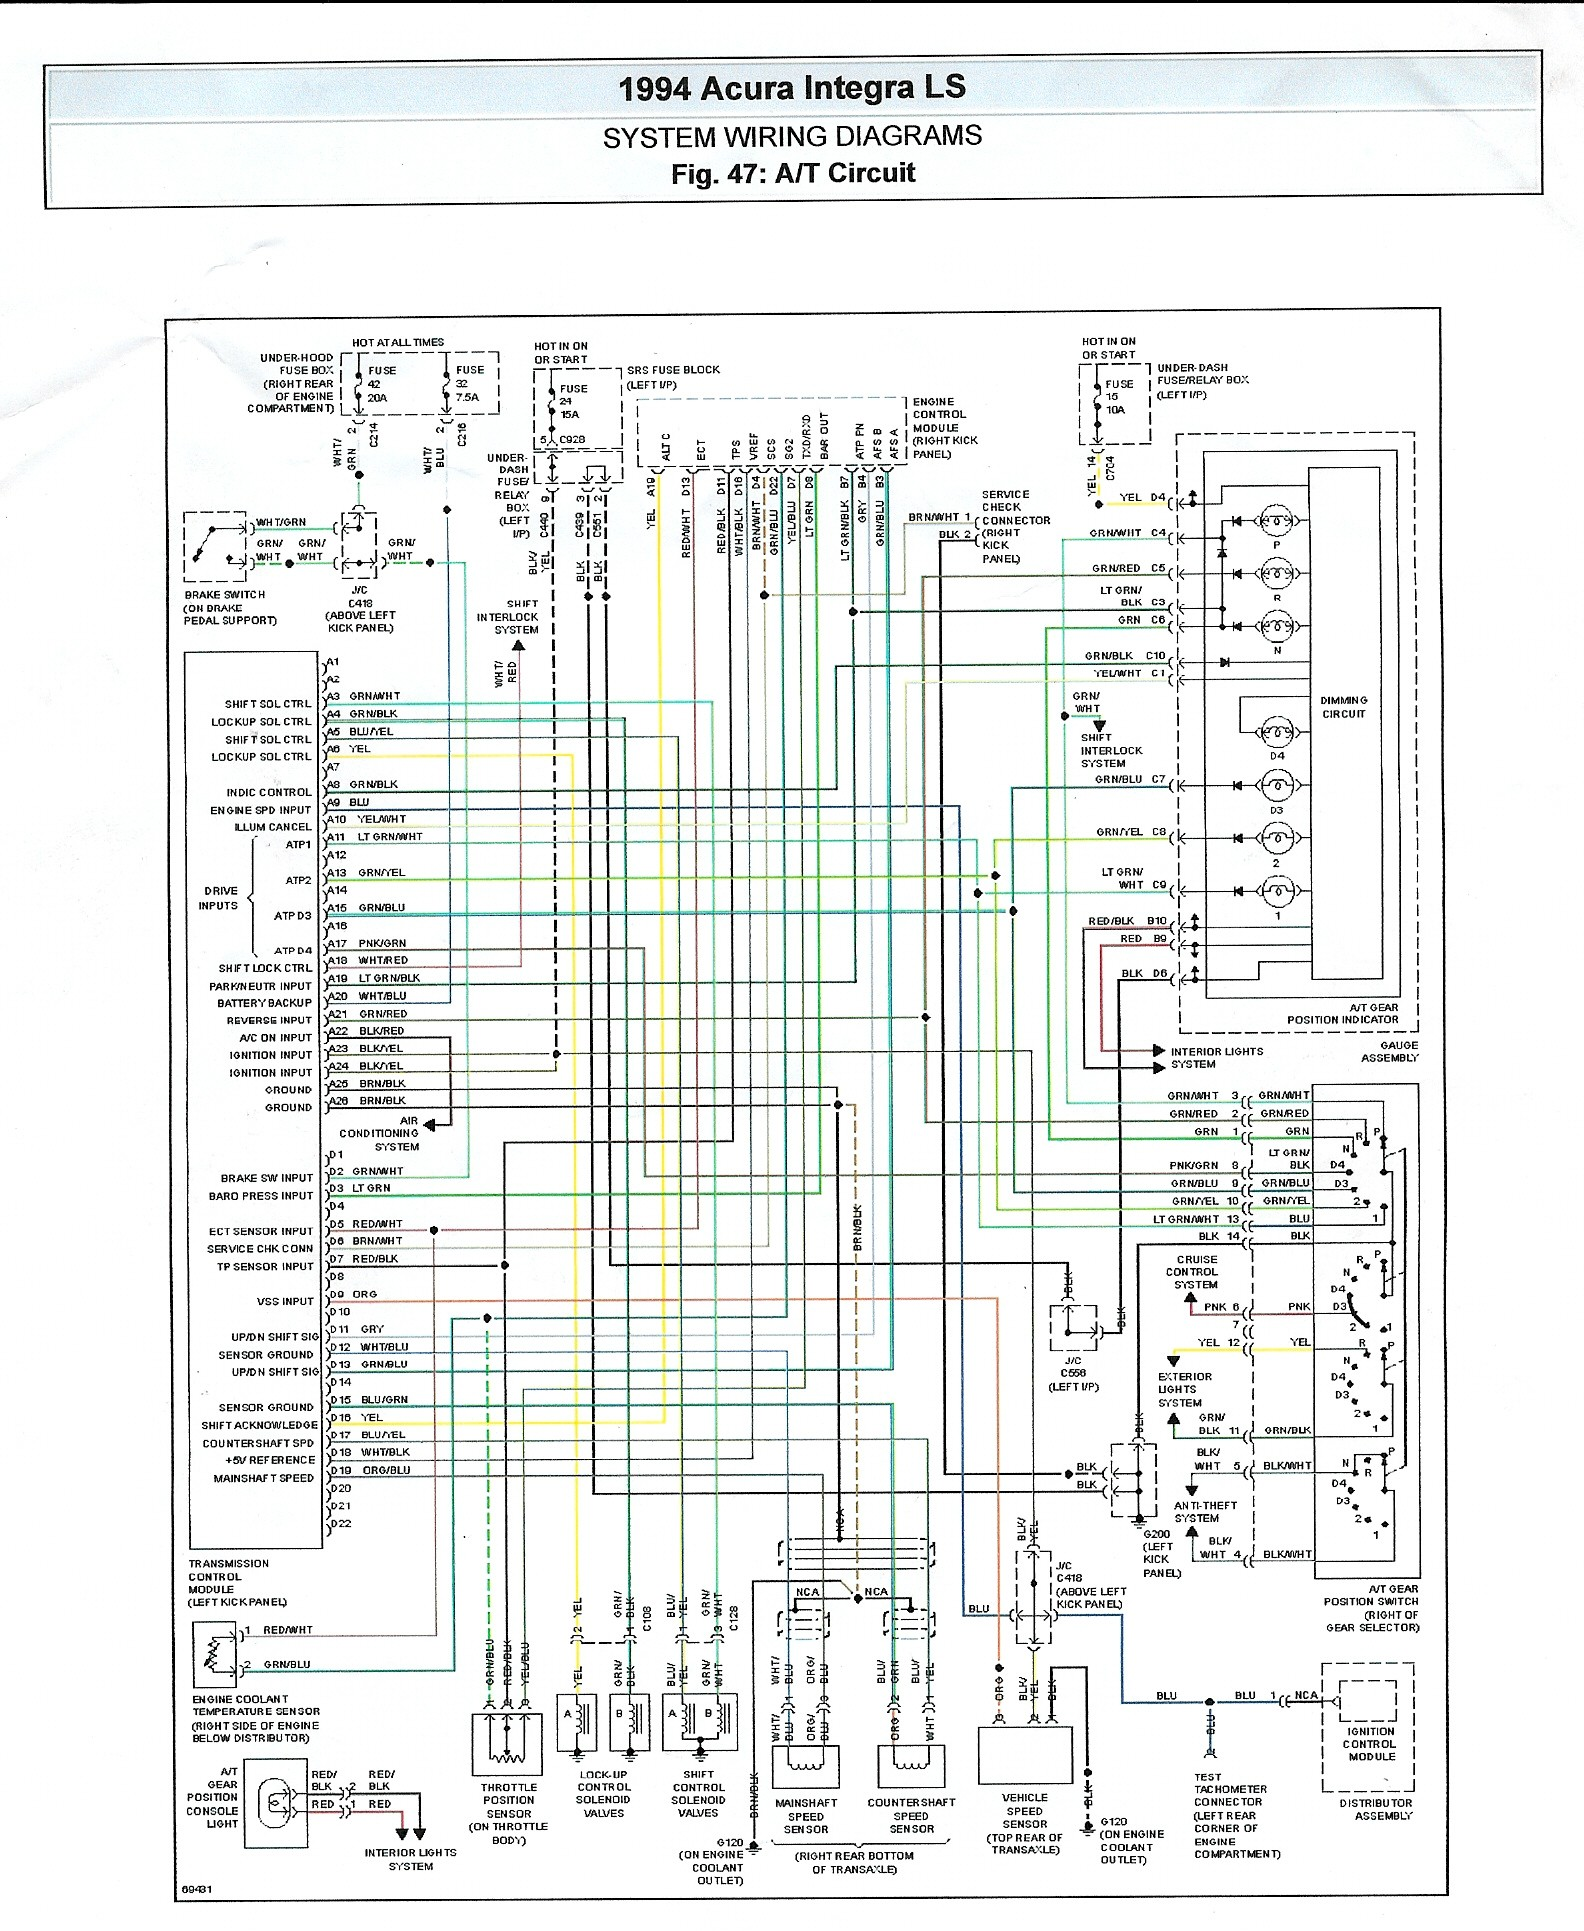 Obd1 Engine Harness Diagram Honda Honda Obd1 Plug and Wire Diagram Wire Center • Of Obd1 Engine Harness Diagram Honda